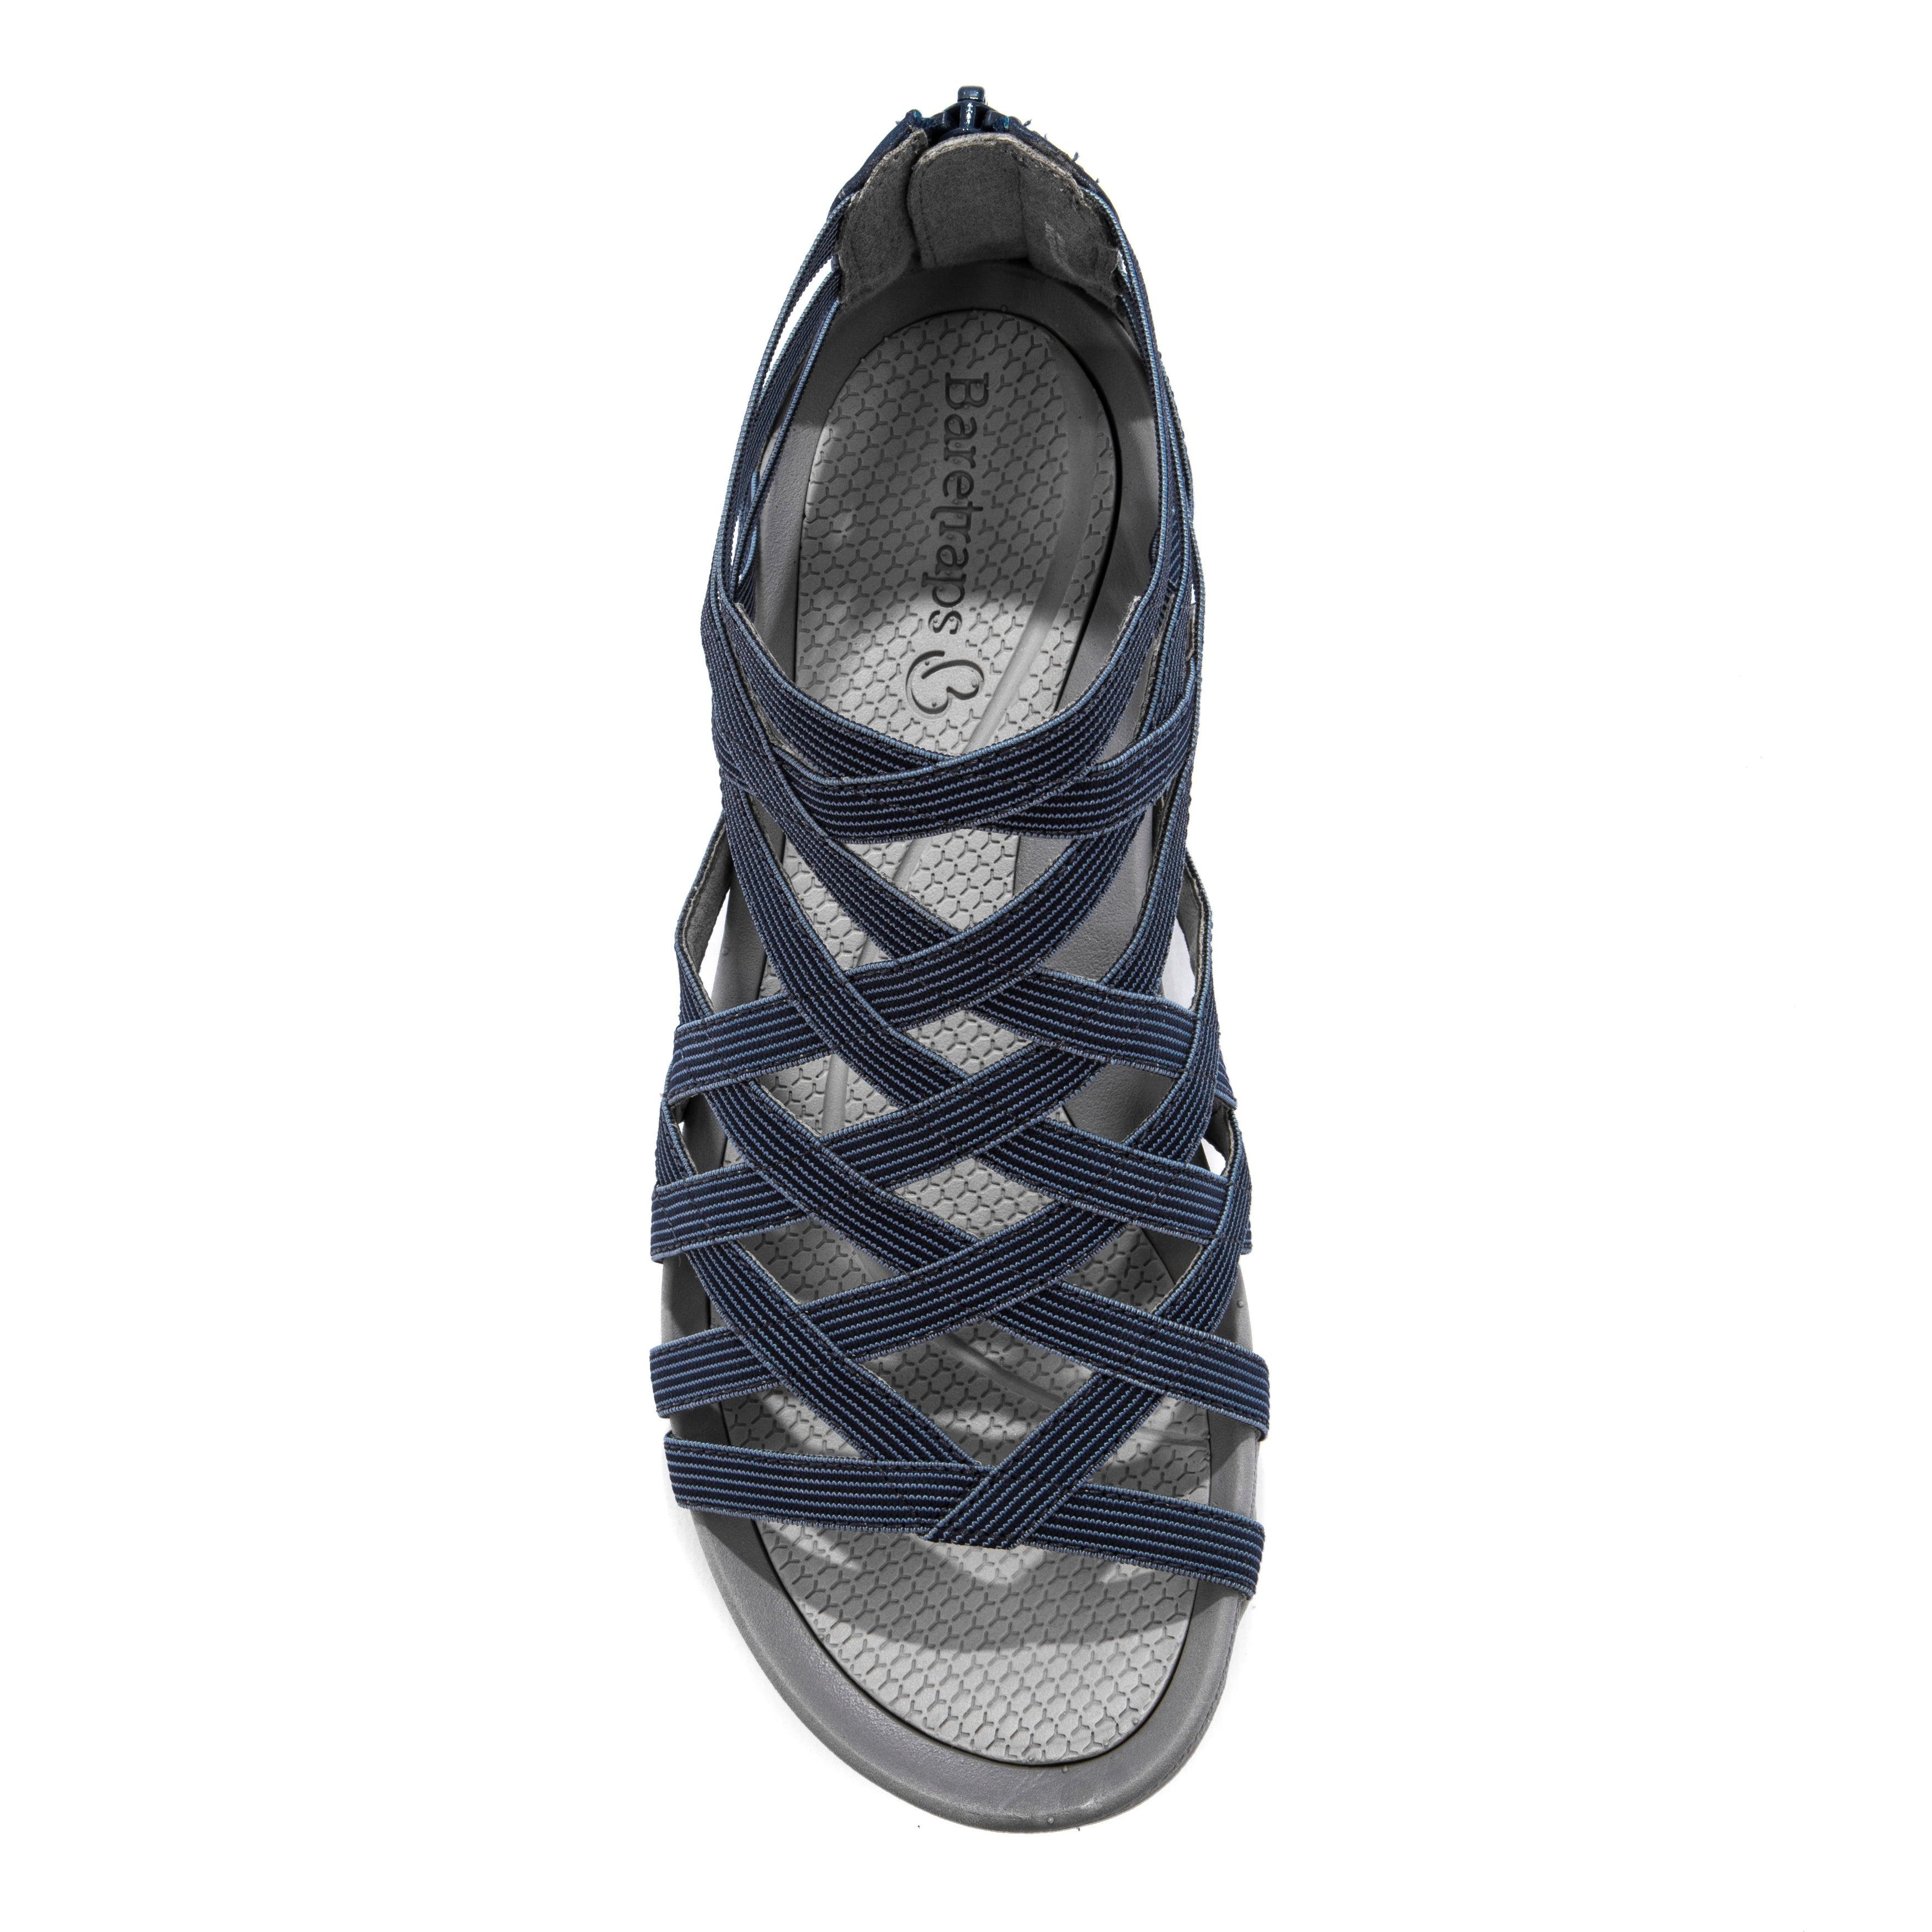 91a3aa2a0a1 Shop Baretraps Samina Women s Sandals Denim Ice - Free Shipping Today -  Overstock - 20984594